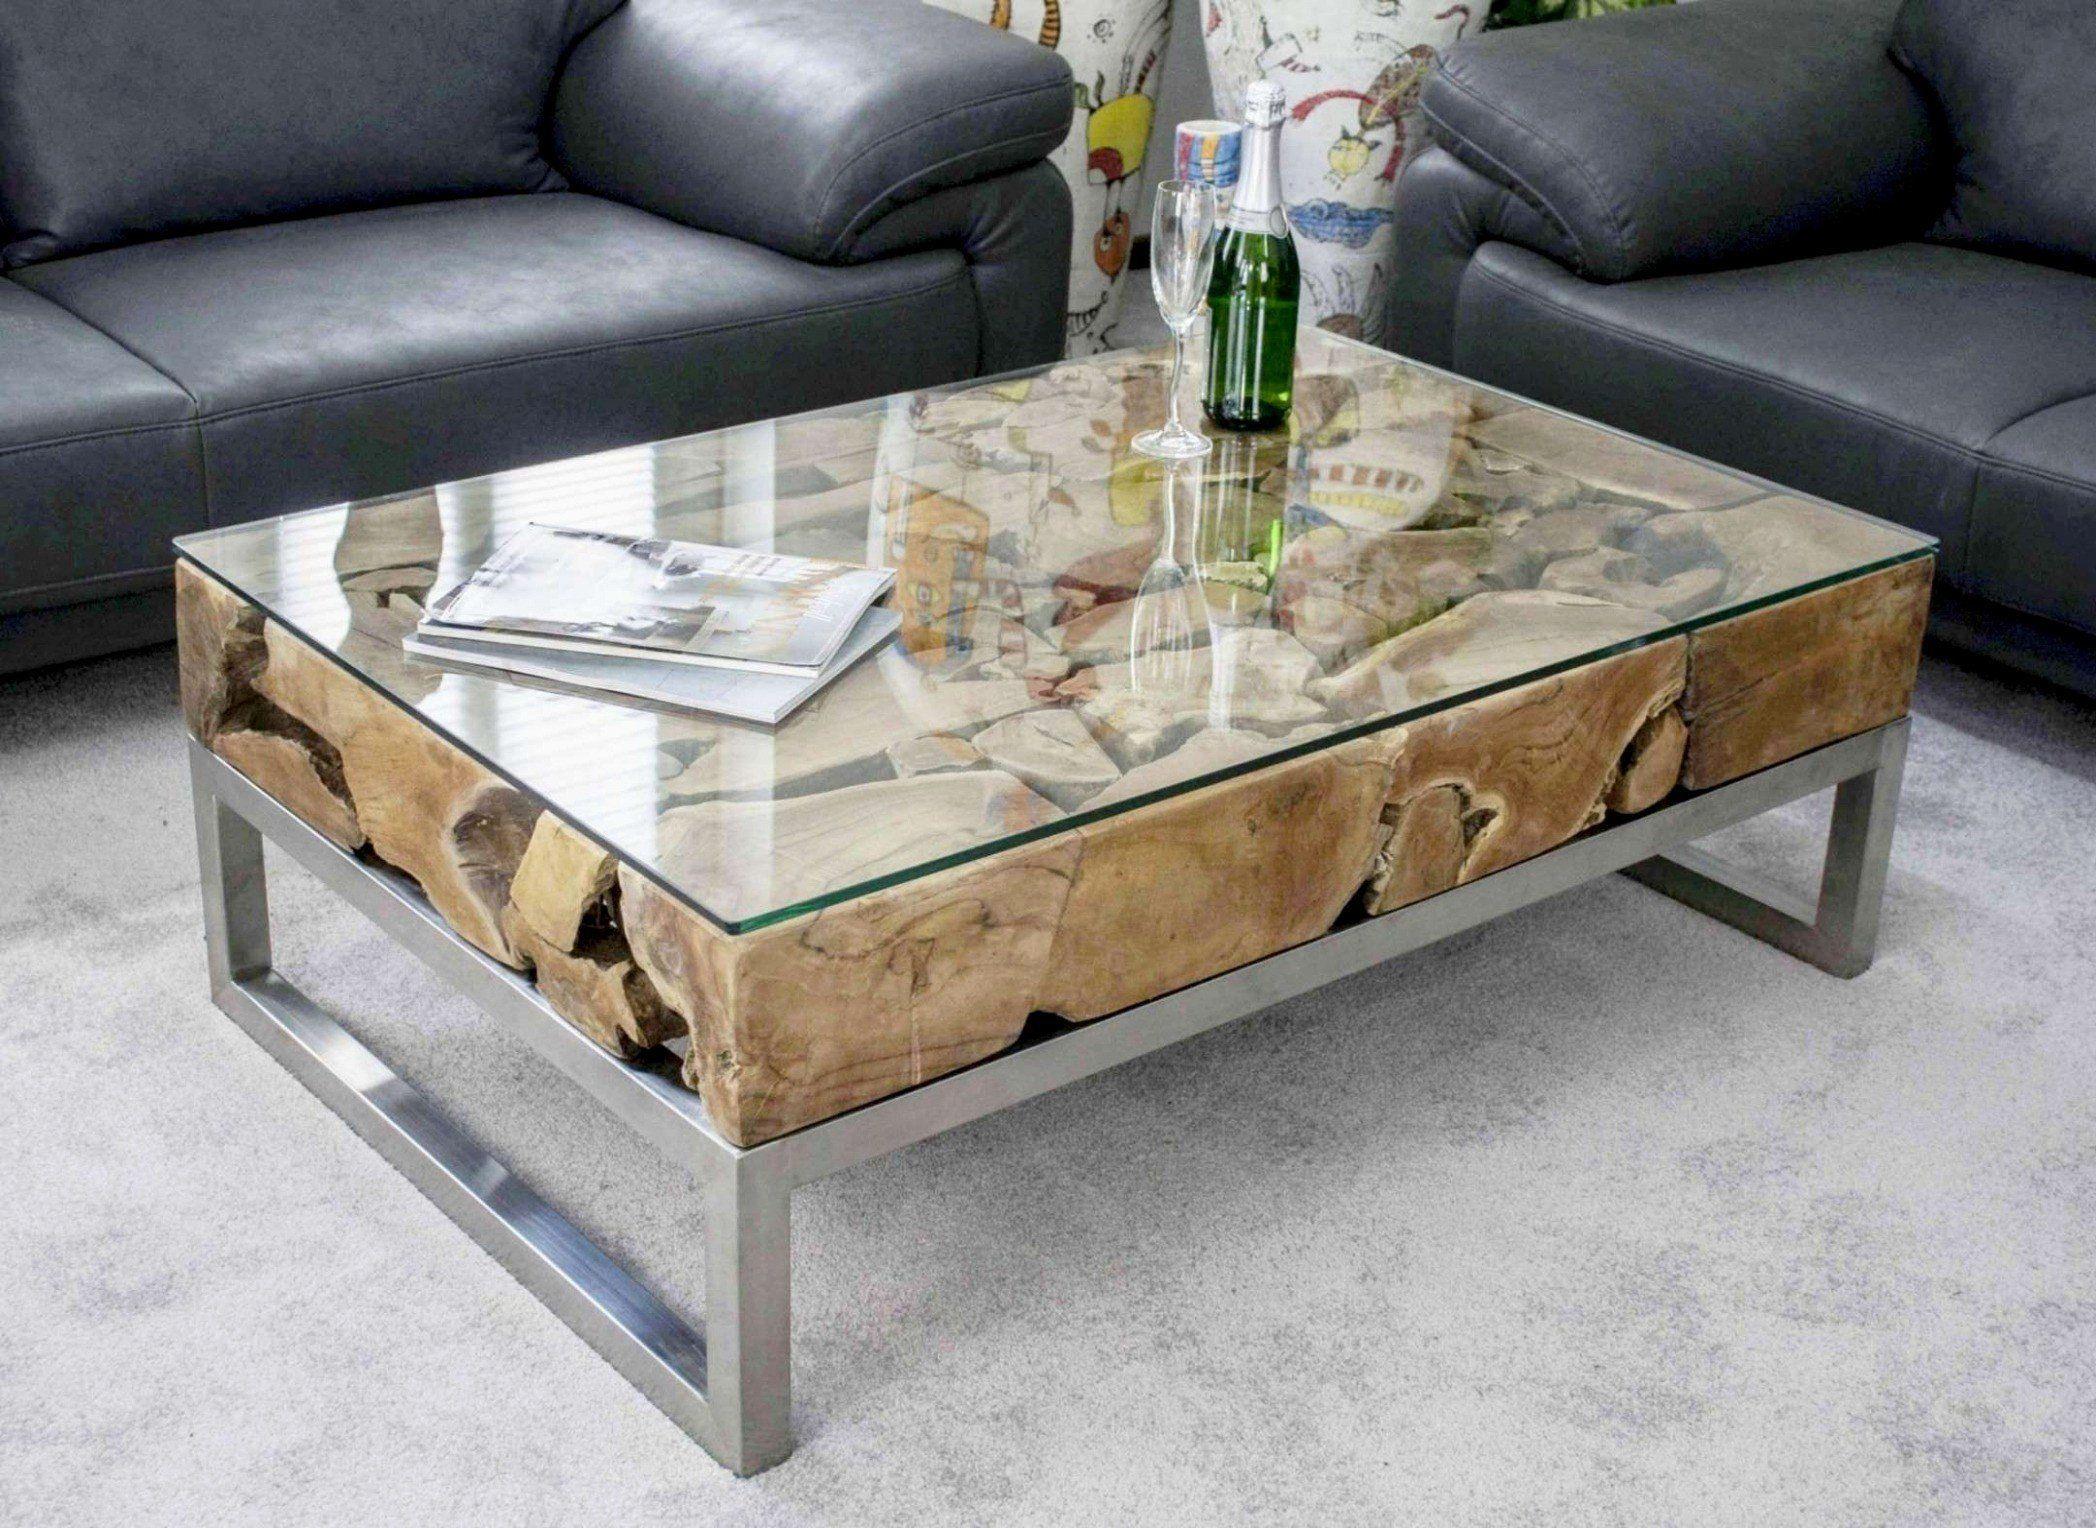 Diy End Table Ideas Inspirational Wohnzimmertisch Diy Idee Deco Interieur Mobilier De Salon Table Basse [ 1528 x 2096 Pixel ]